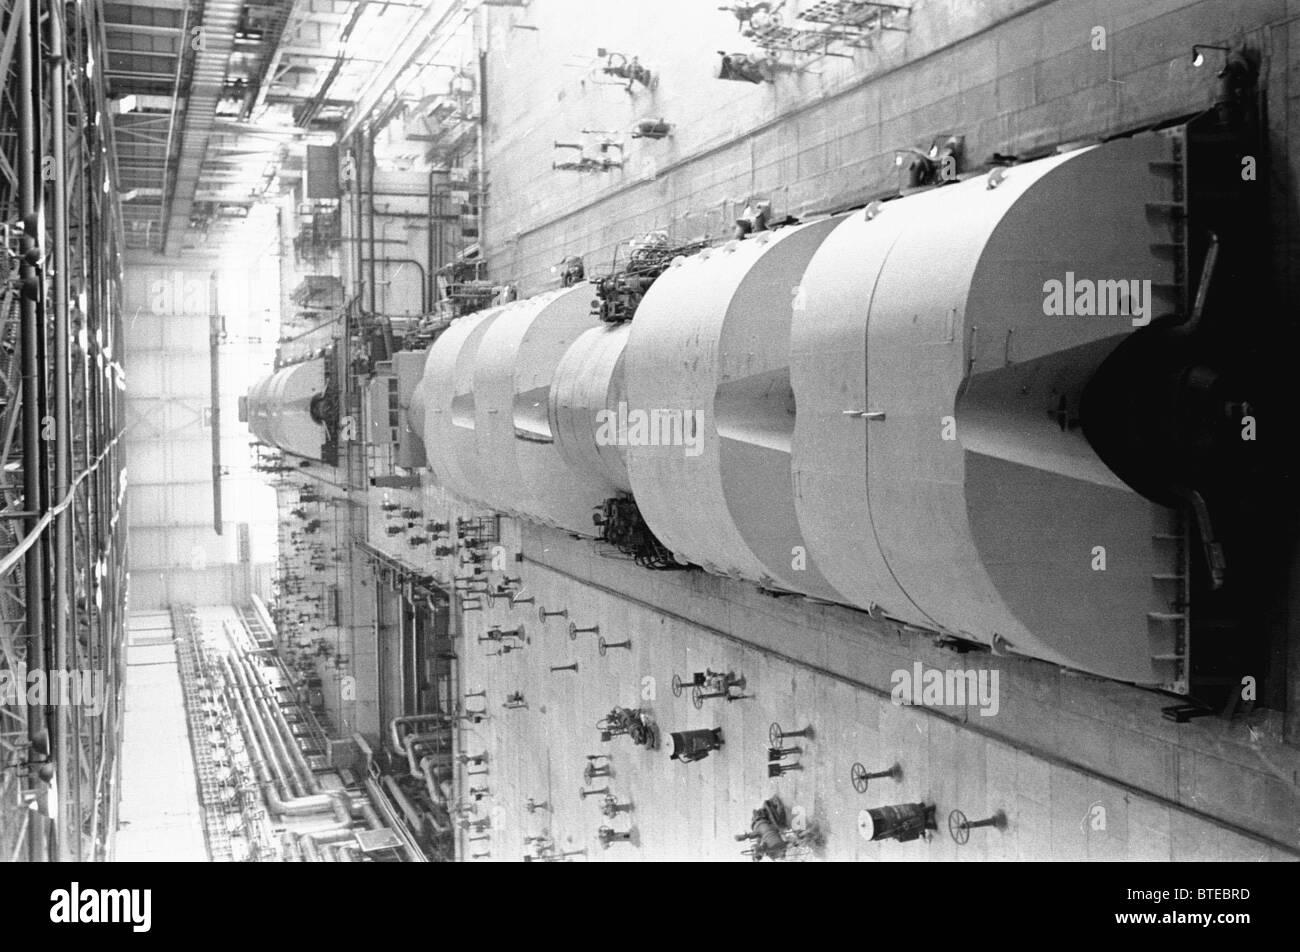 Chernobyl N-plant - Stock Image